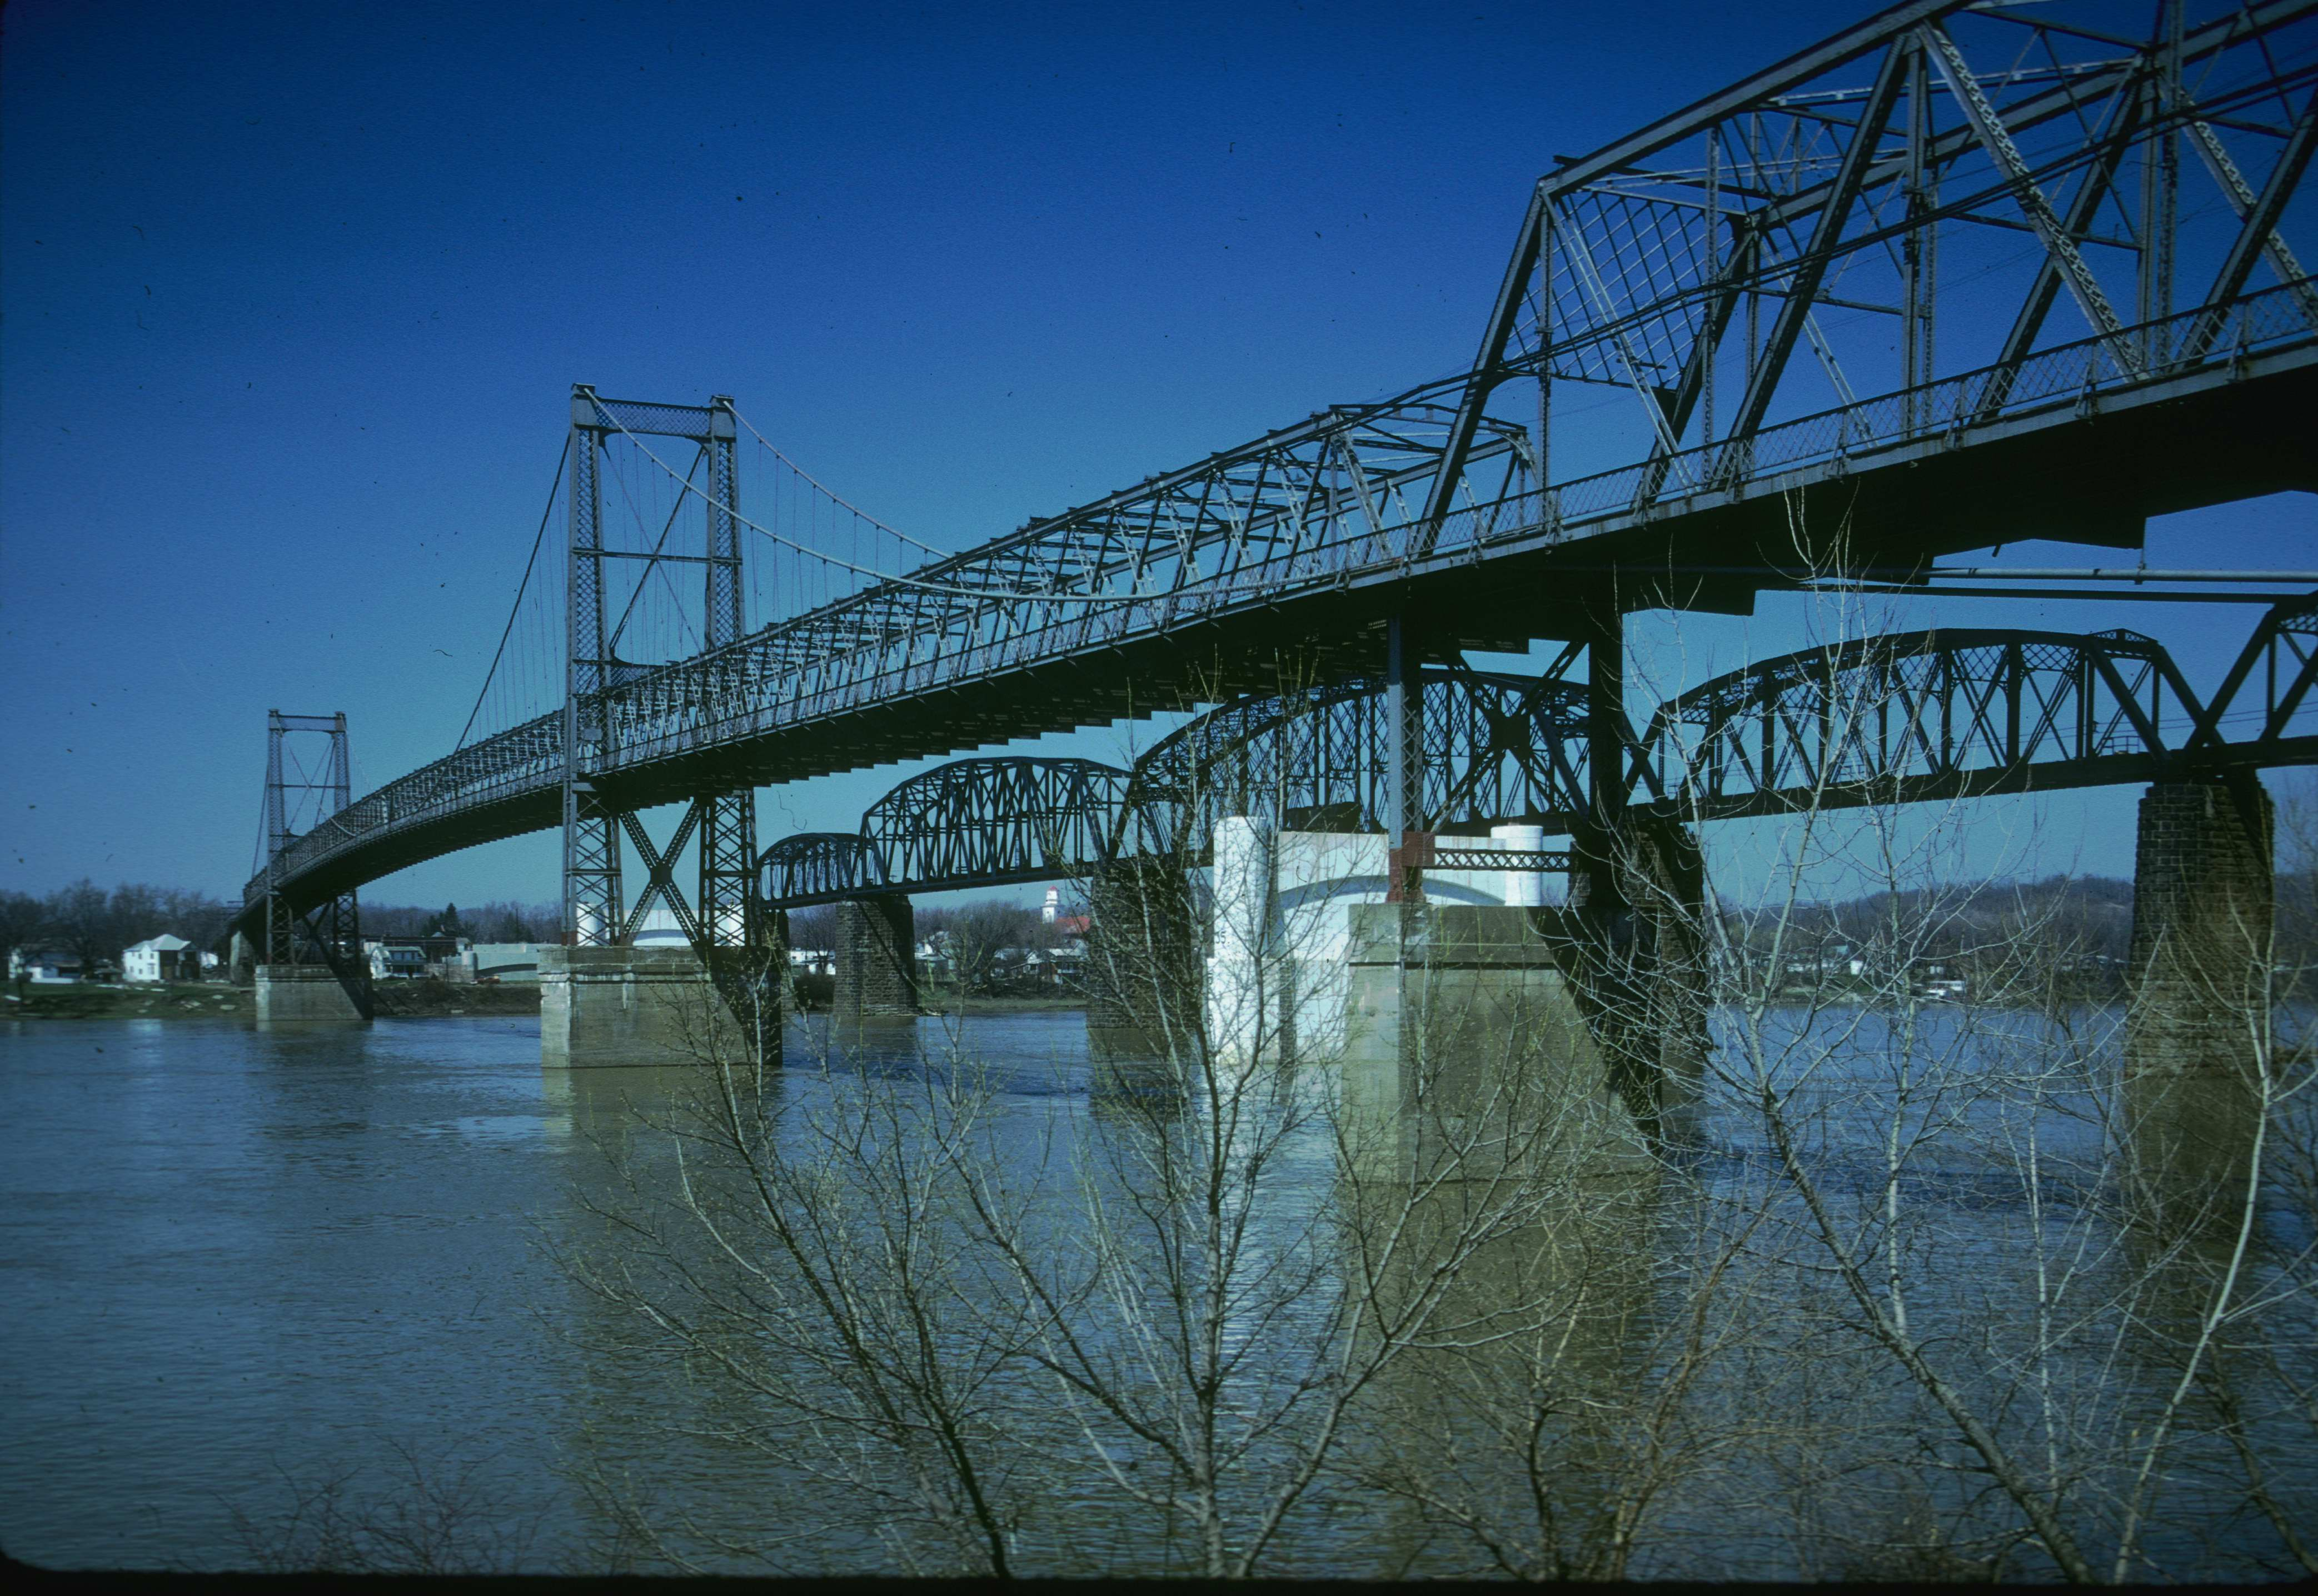 Parkersburg-Belpre Bridge and Sixth Street Railroad Bridge